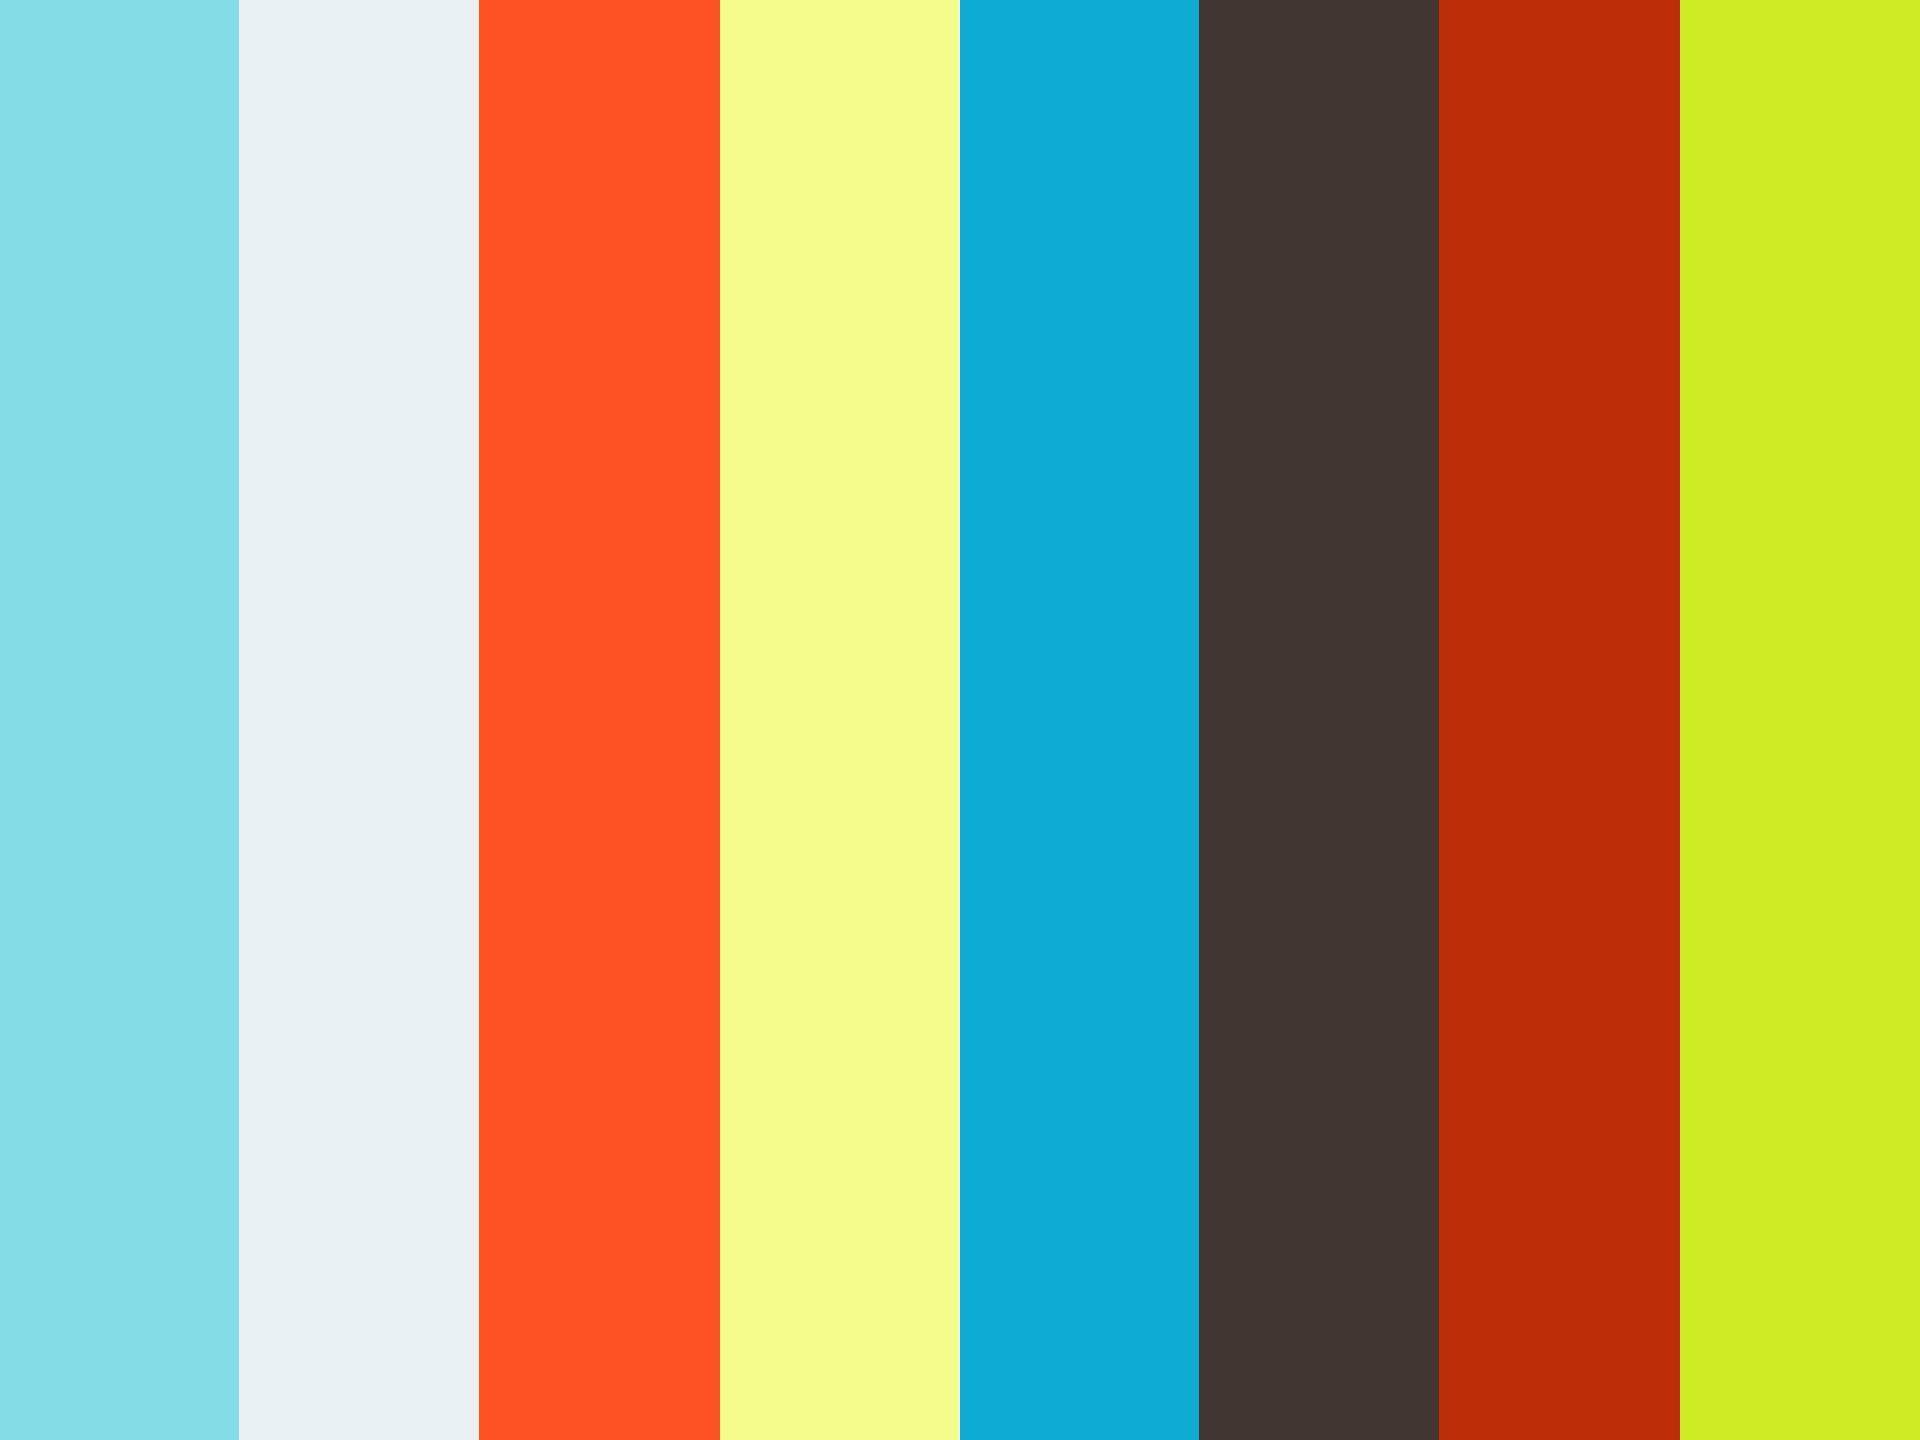 【Proflab】飯沼利光 教授インタビュー:日本大学歯学部 歯科補綴学 第1講座(総義歯補綴学講座)